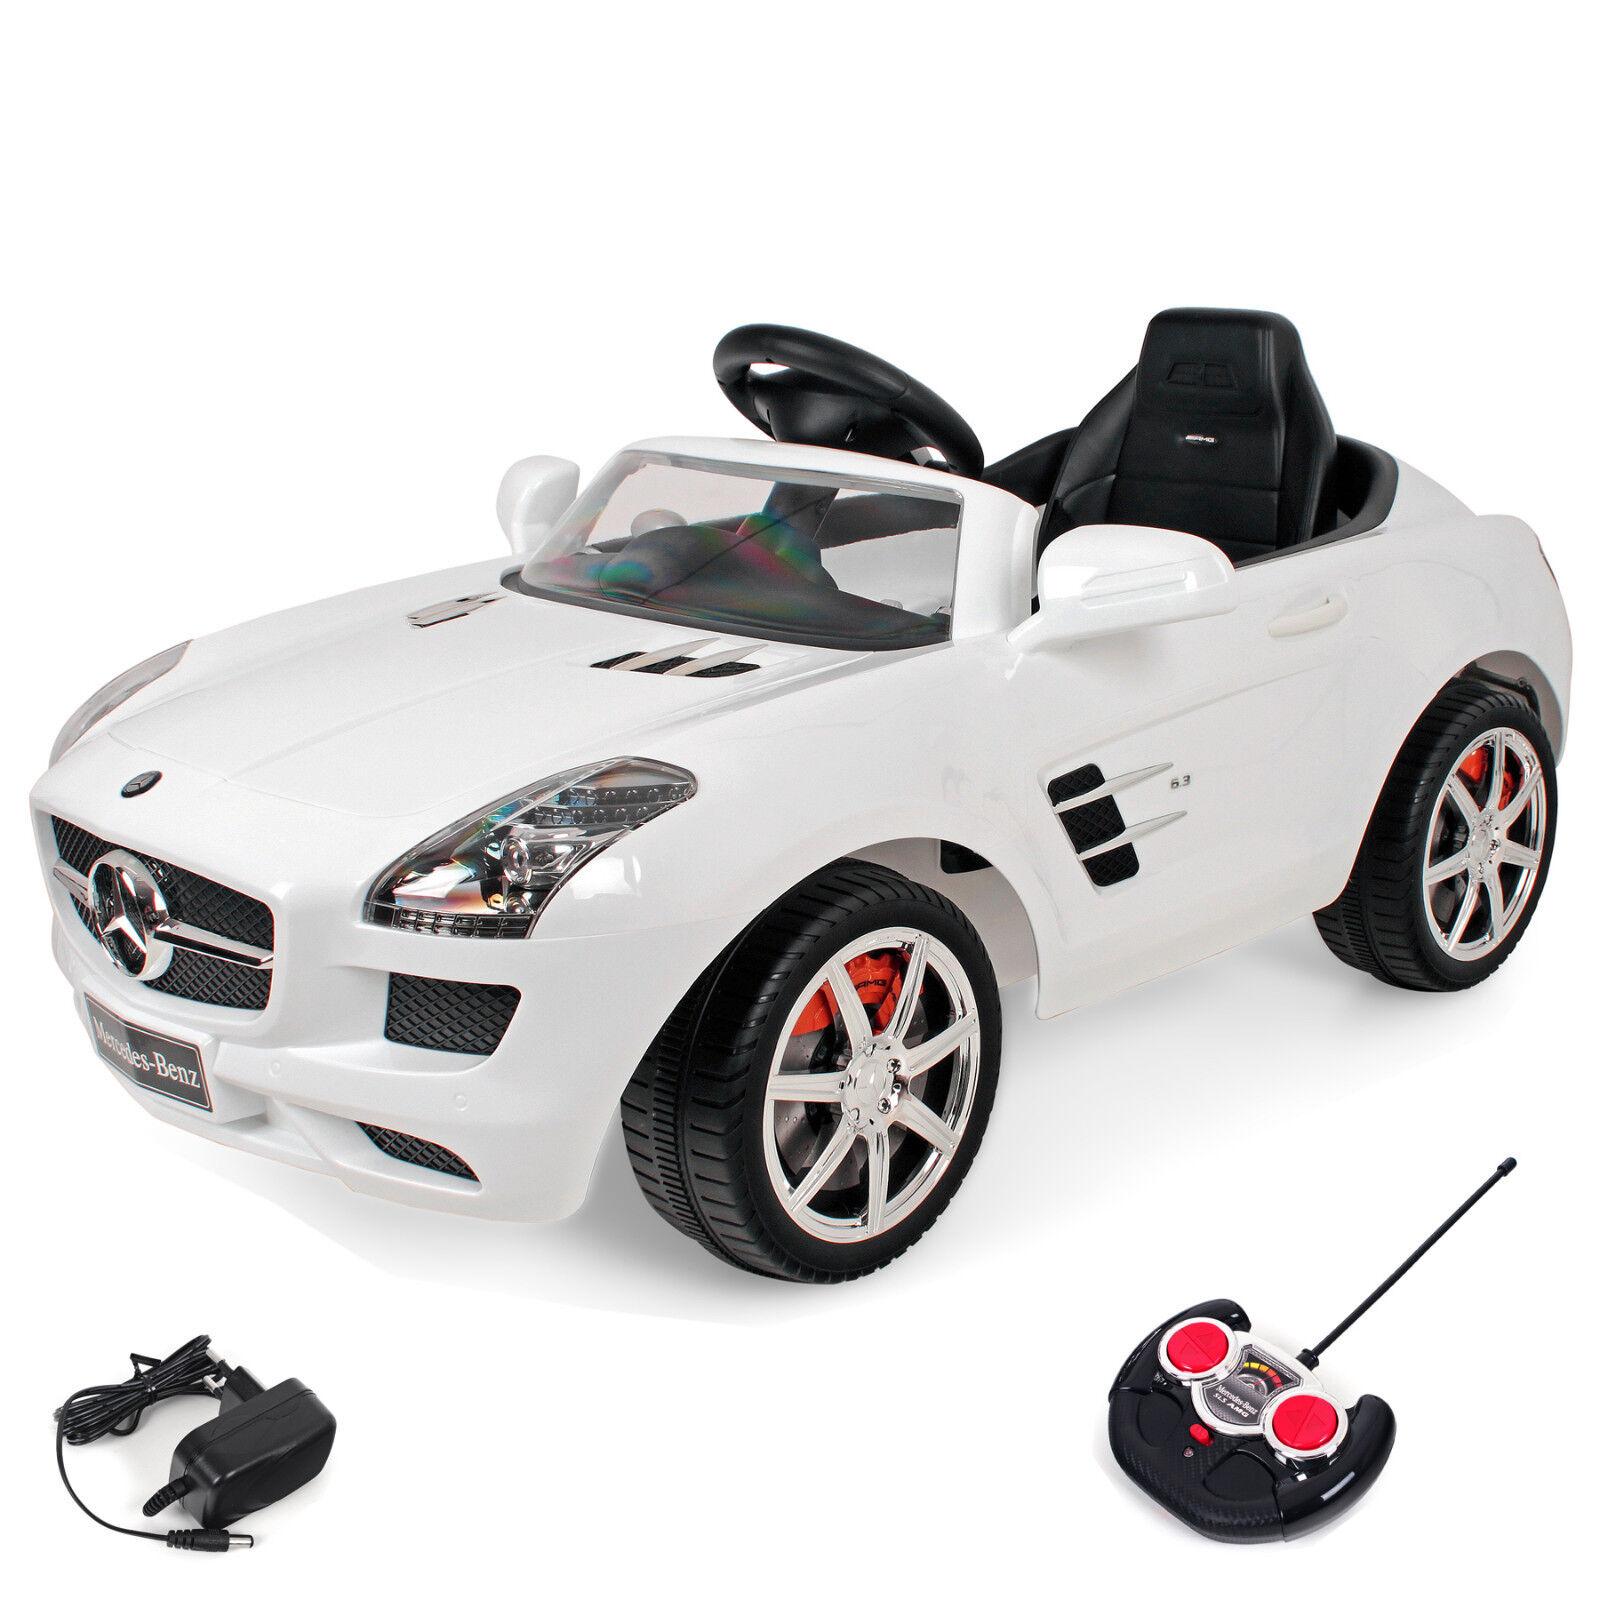 Kinderauto Mercedes SLS Elektroauto Auto Kinderfahrzeug Kinder Auto Elektroauto Spielzeug 681-R 0da72c